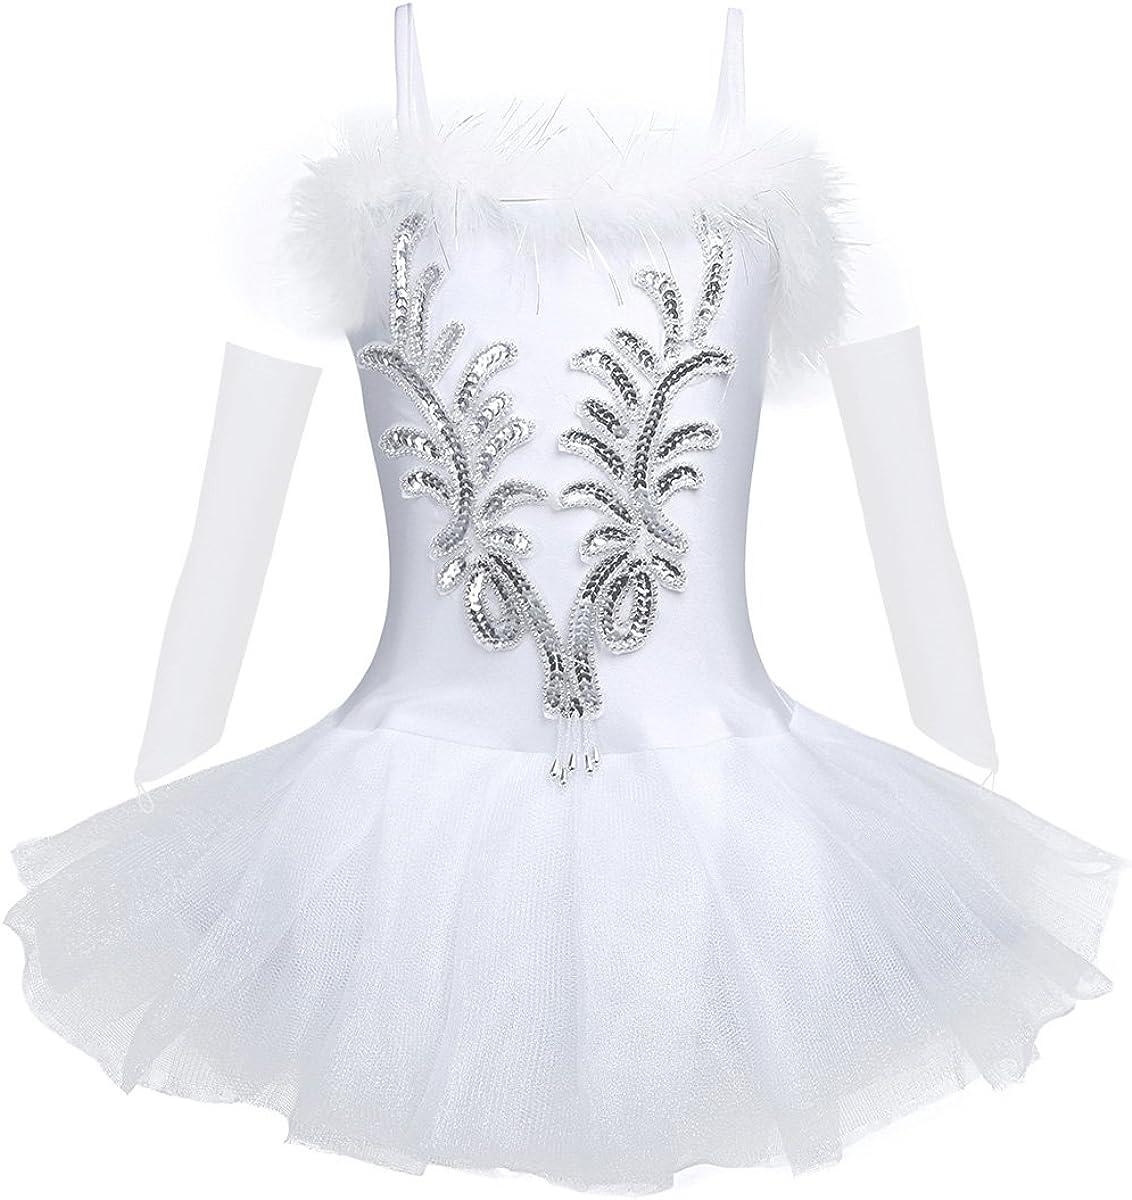 Yartina Kids Girls Swan Lake Ballet Dance Tutu Dress Performance Costume Sequins Leotard with Long Gloves and Hair Clip Set